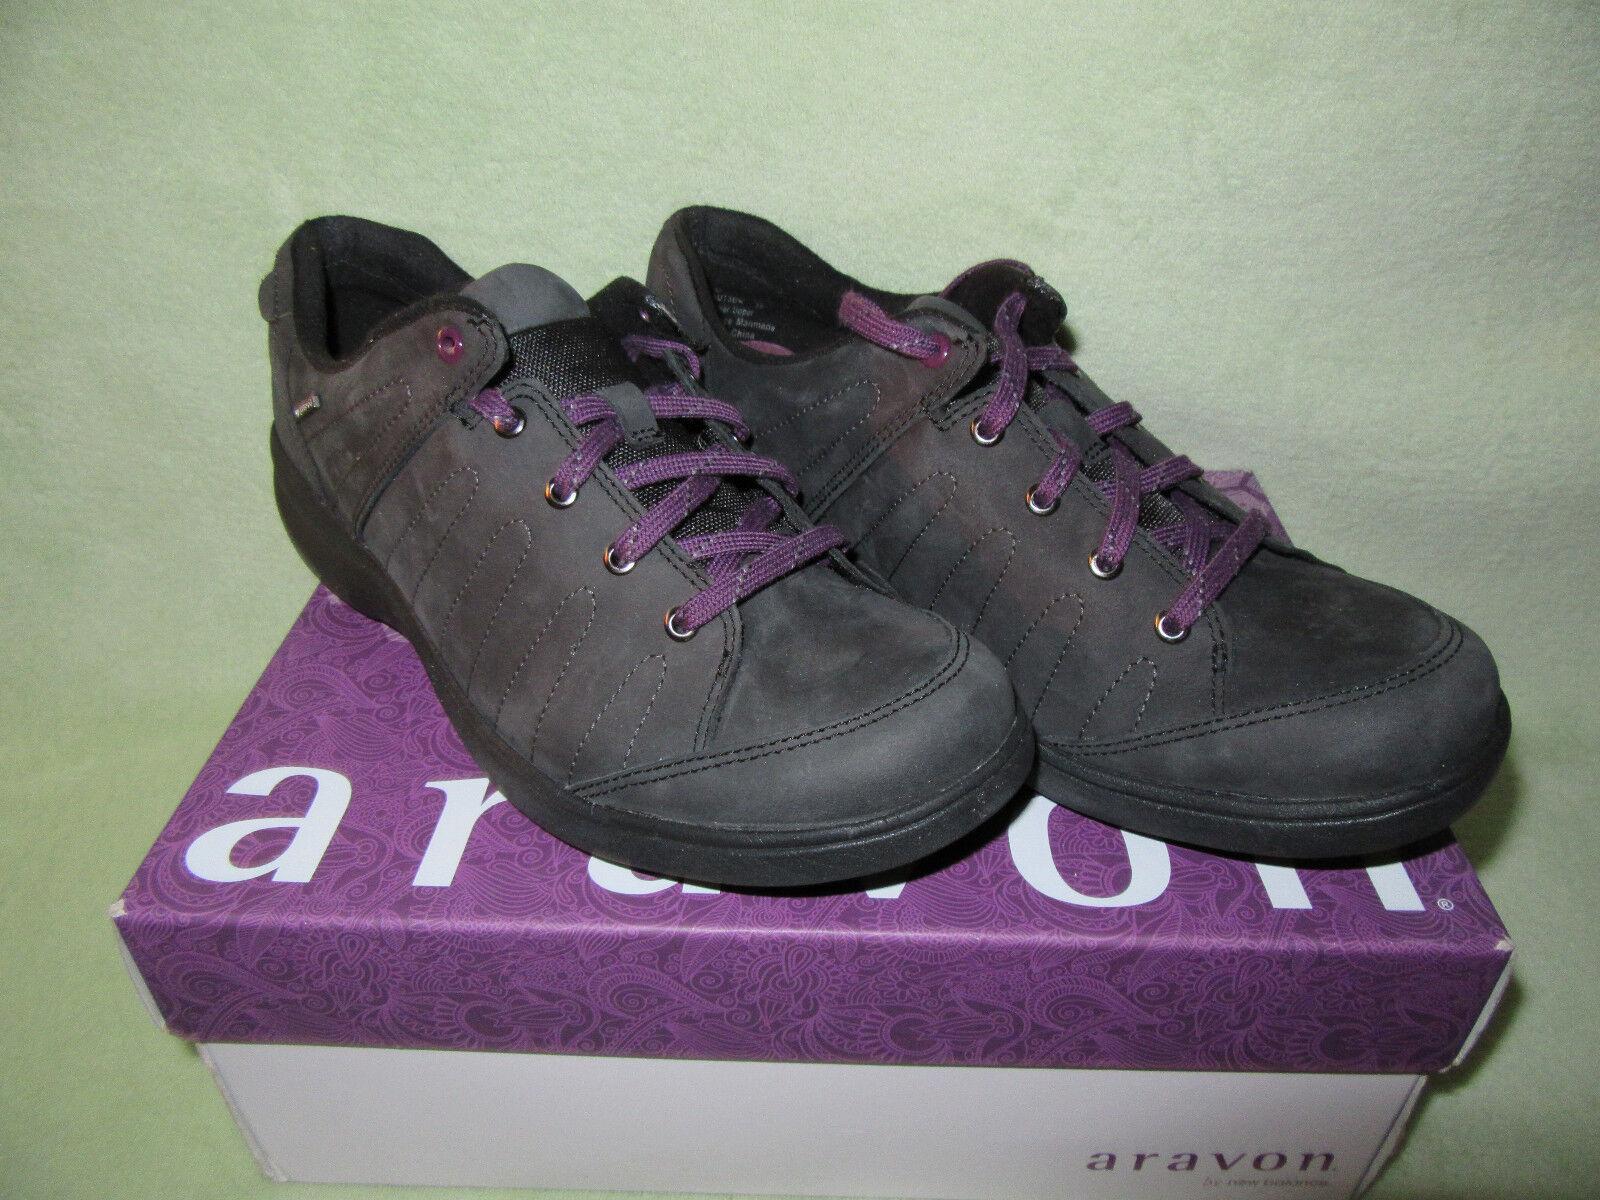 Aravon by New Balance Revsavor 8 Black Leather Upper WaterProof Tennis Shoes